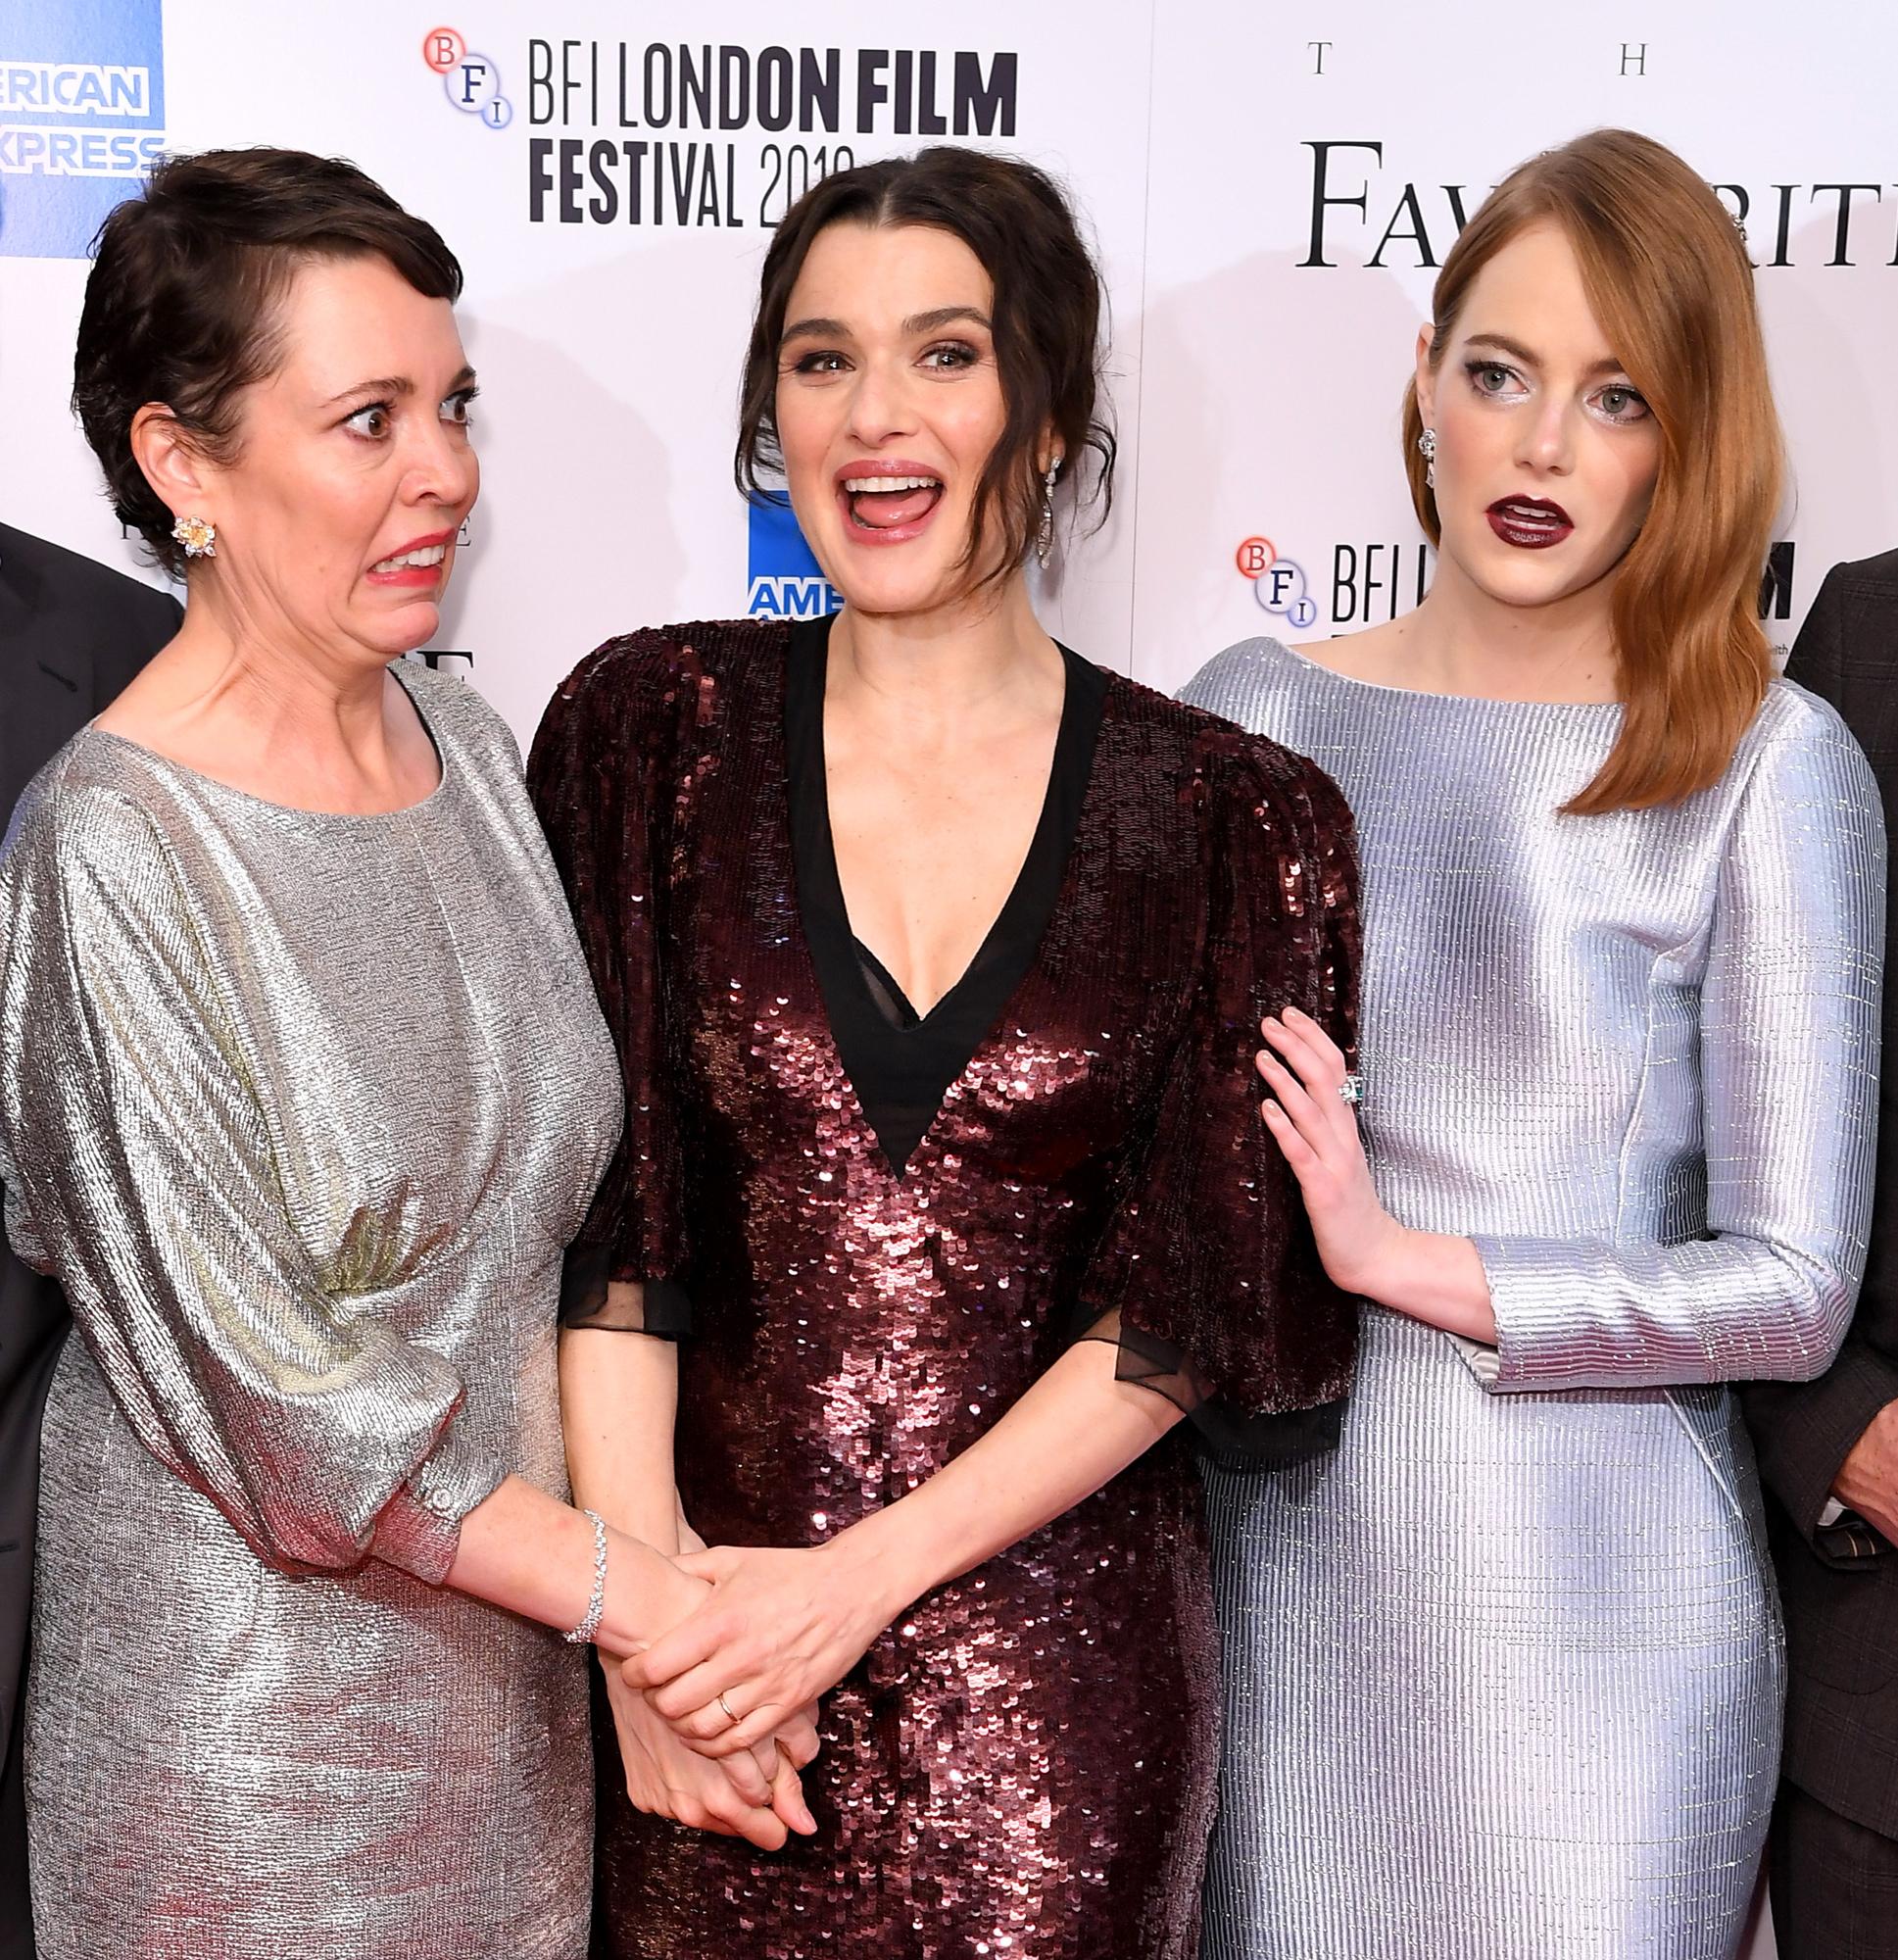 Olivia Colman, Rachel Weisz and Emma Stone